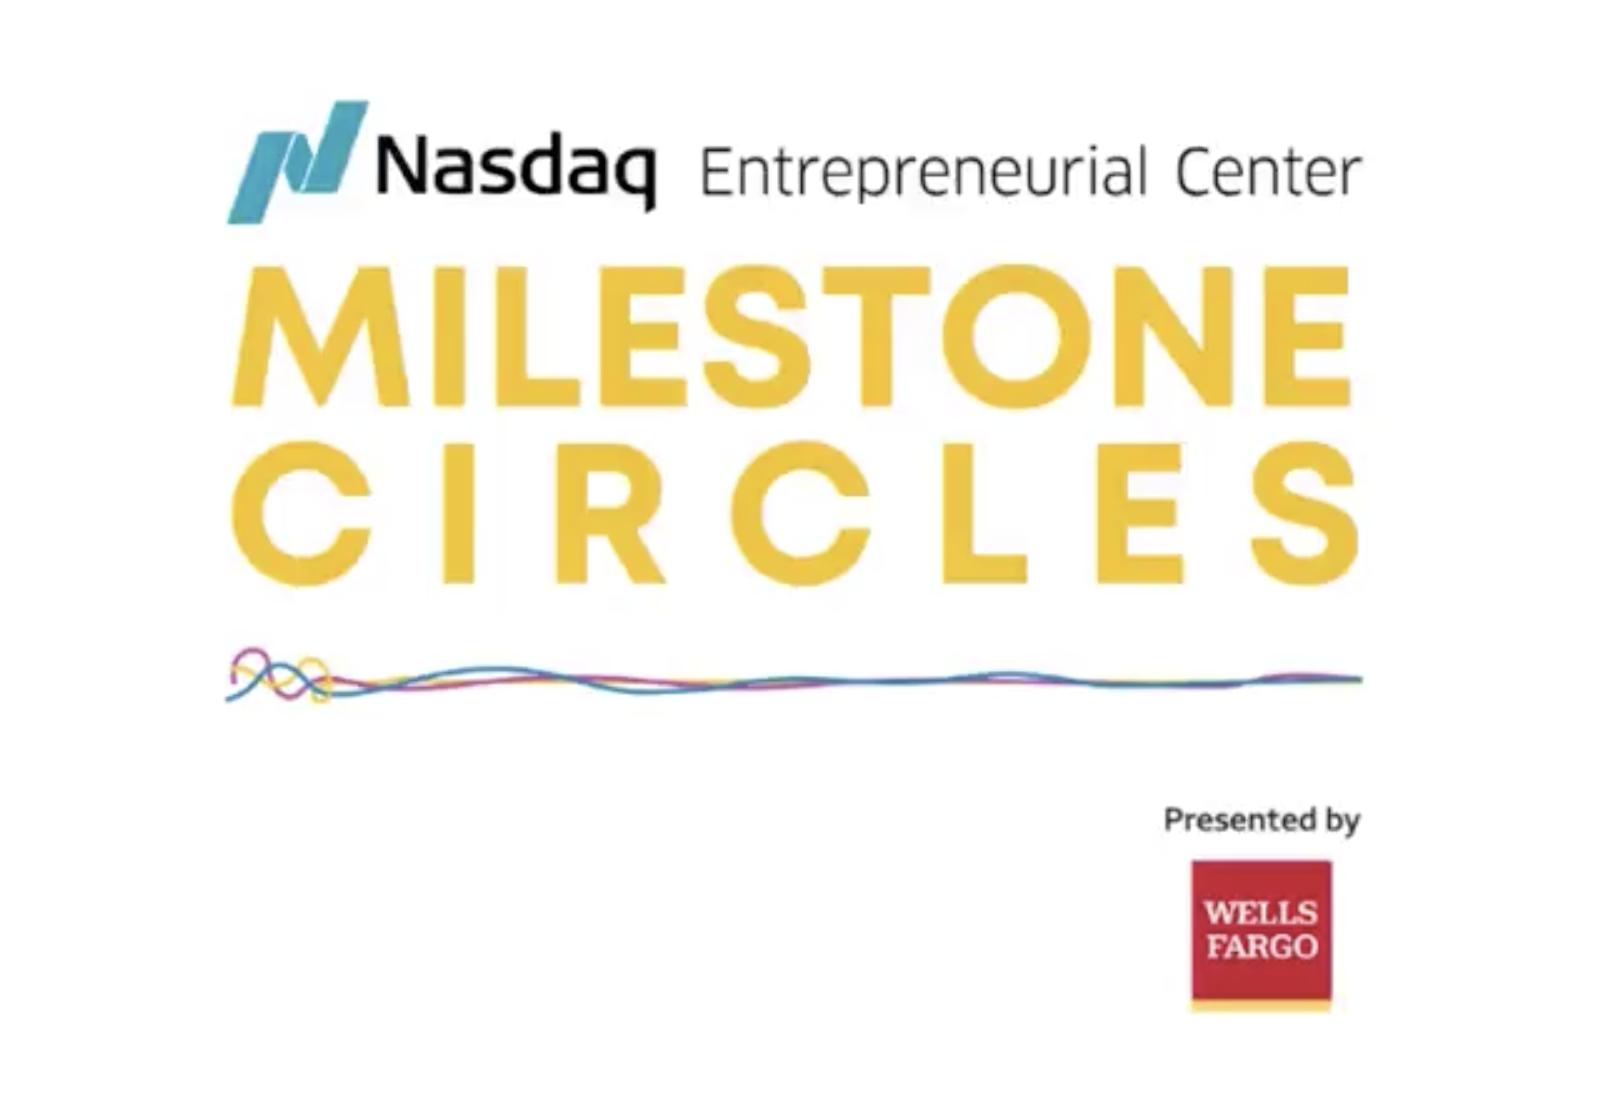 Nasdaq Milestone Circles